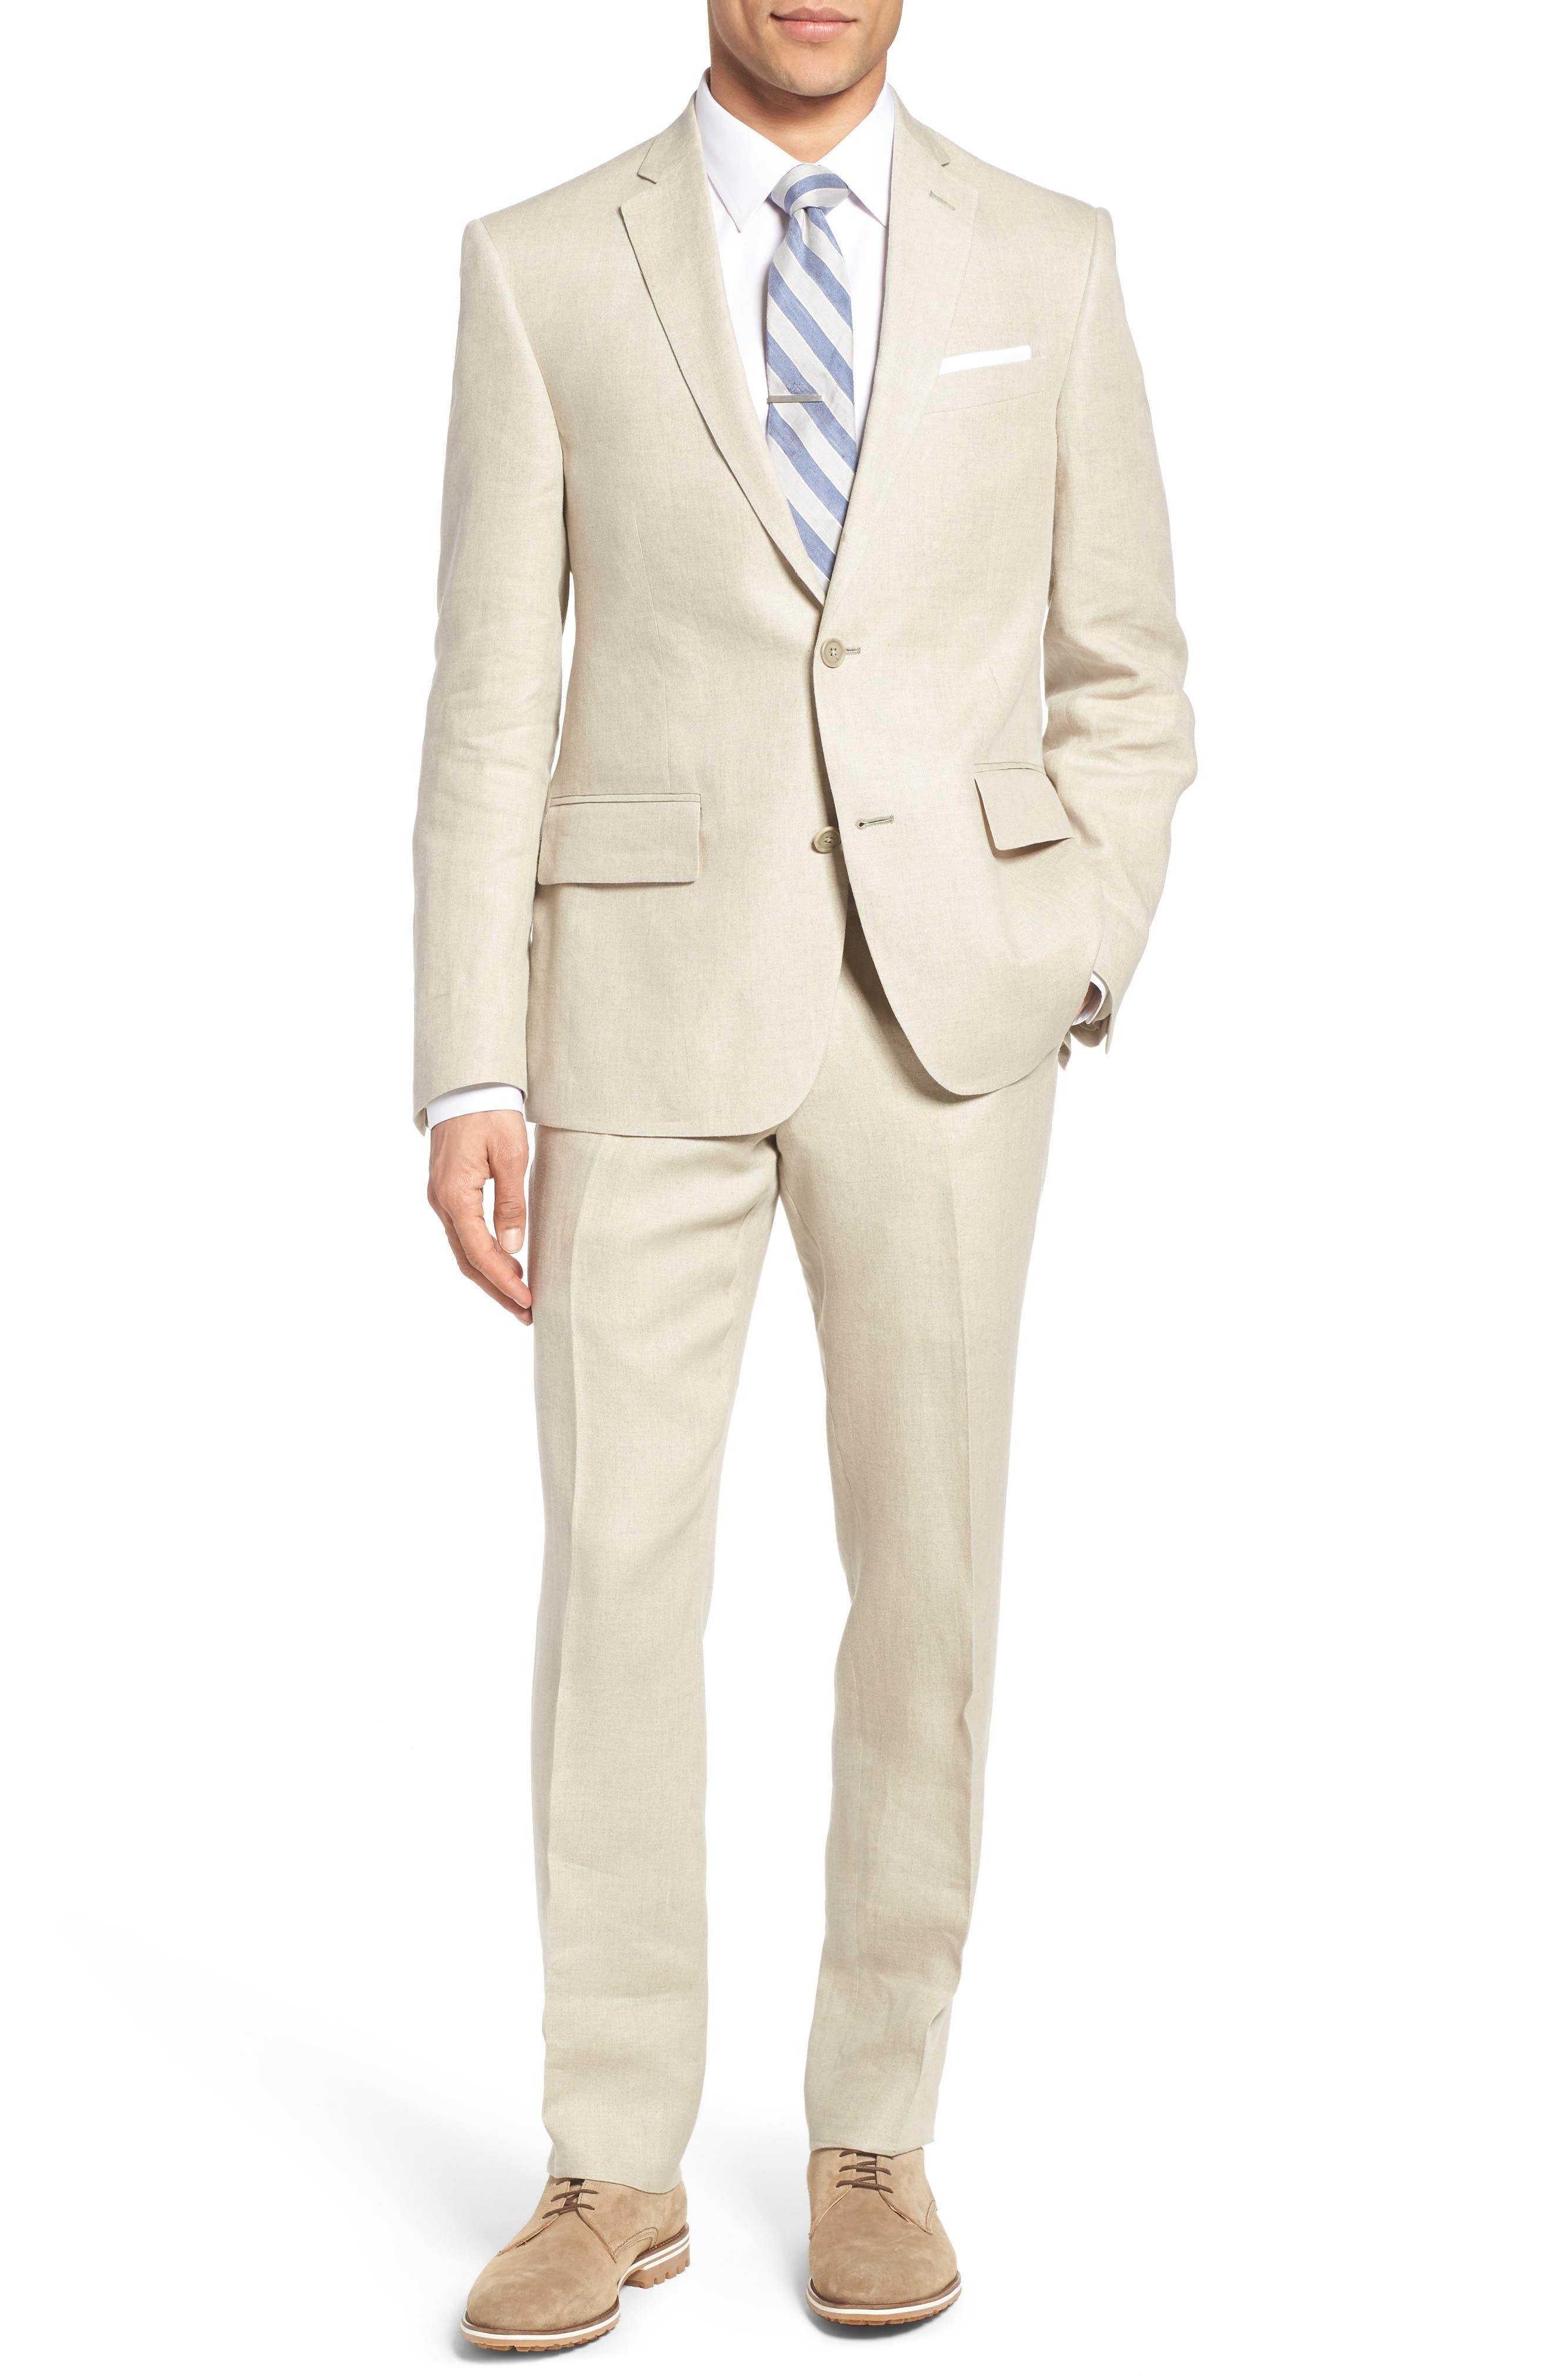 Nordstrom Men's Shop Linen Blazer, Vest & Trousers Outfit with Accessories